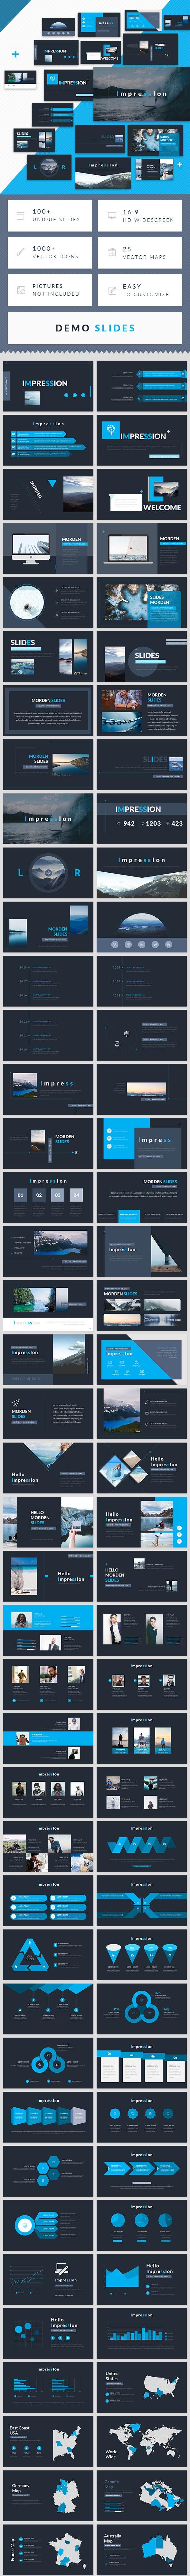 Impression - Minimal Keynote Presentation Template - Business Keynote Templates